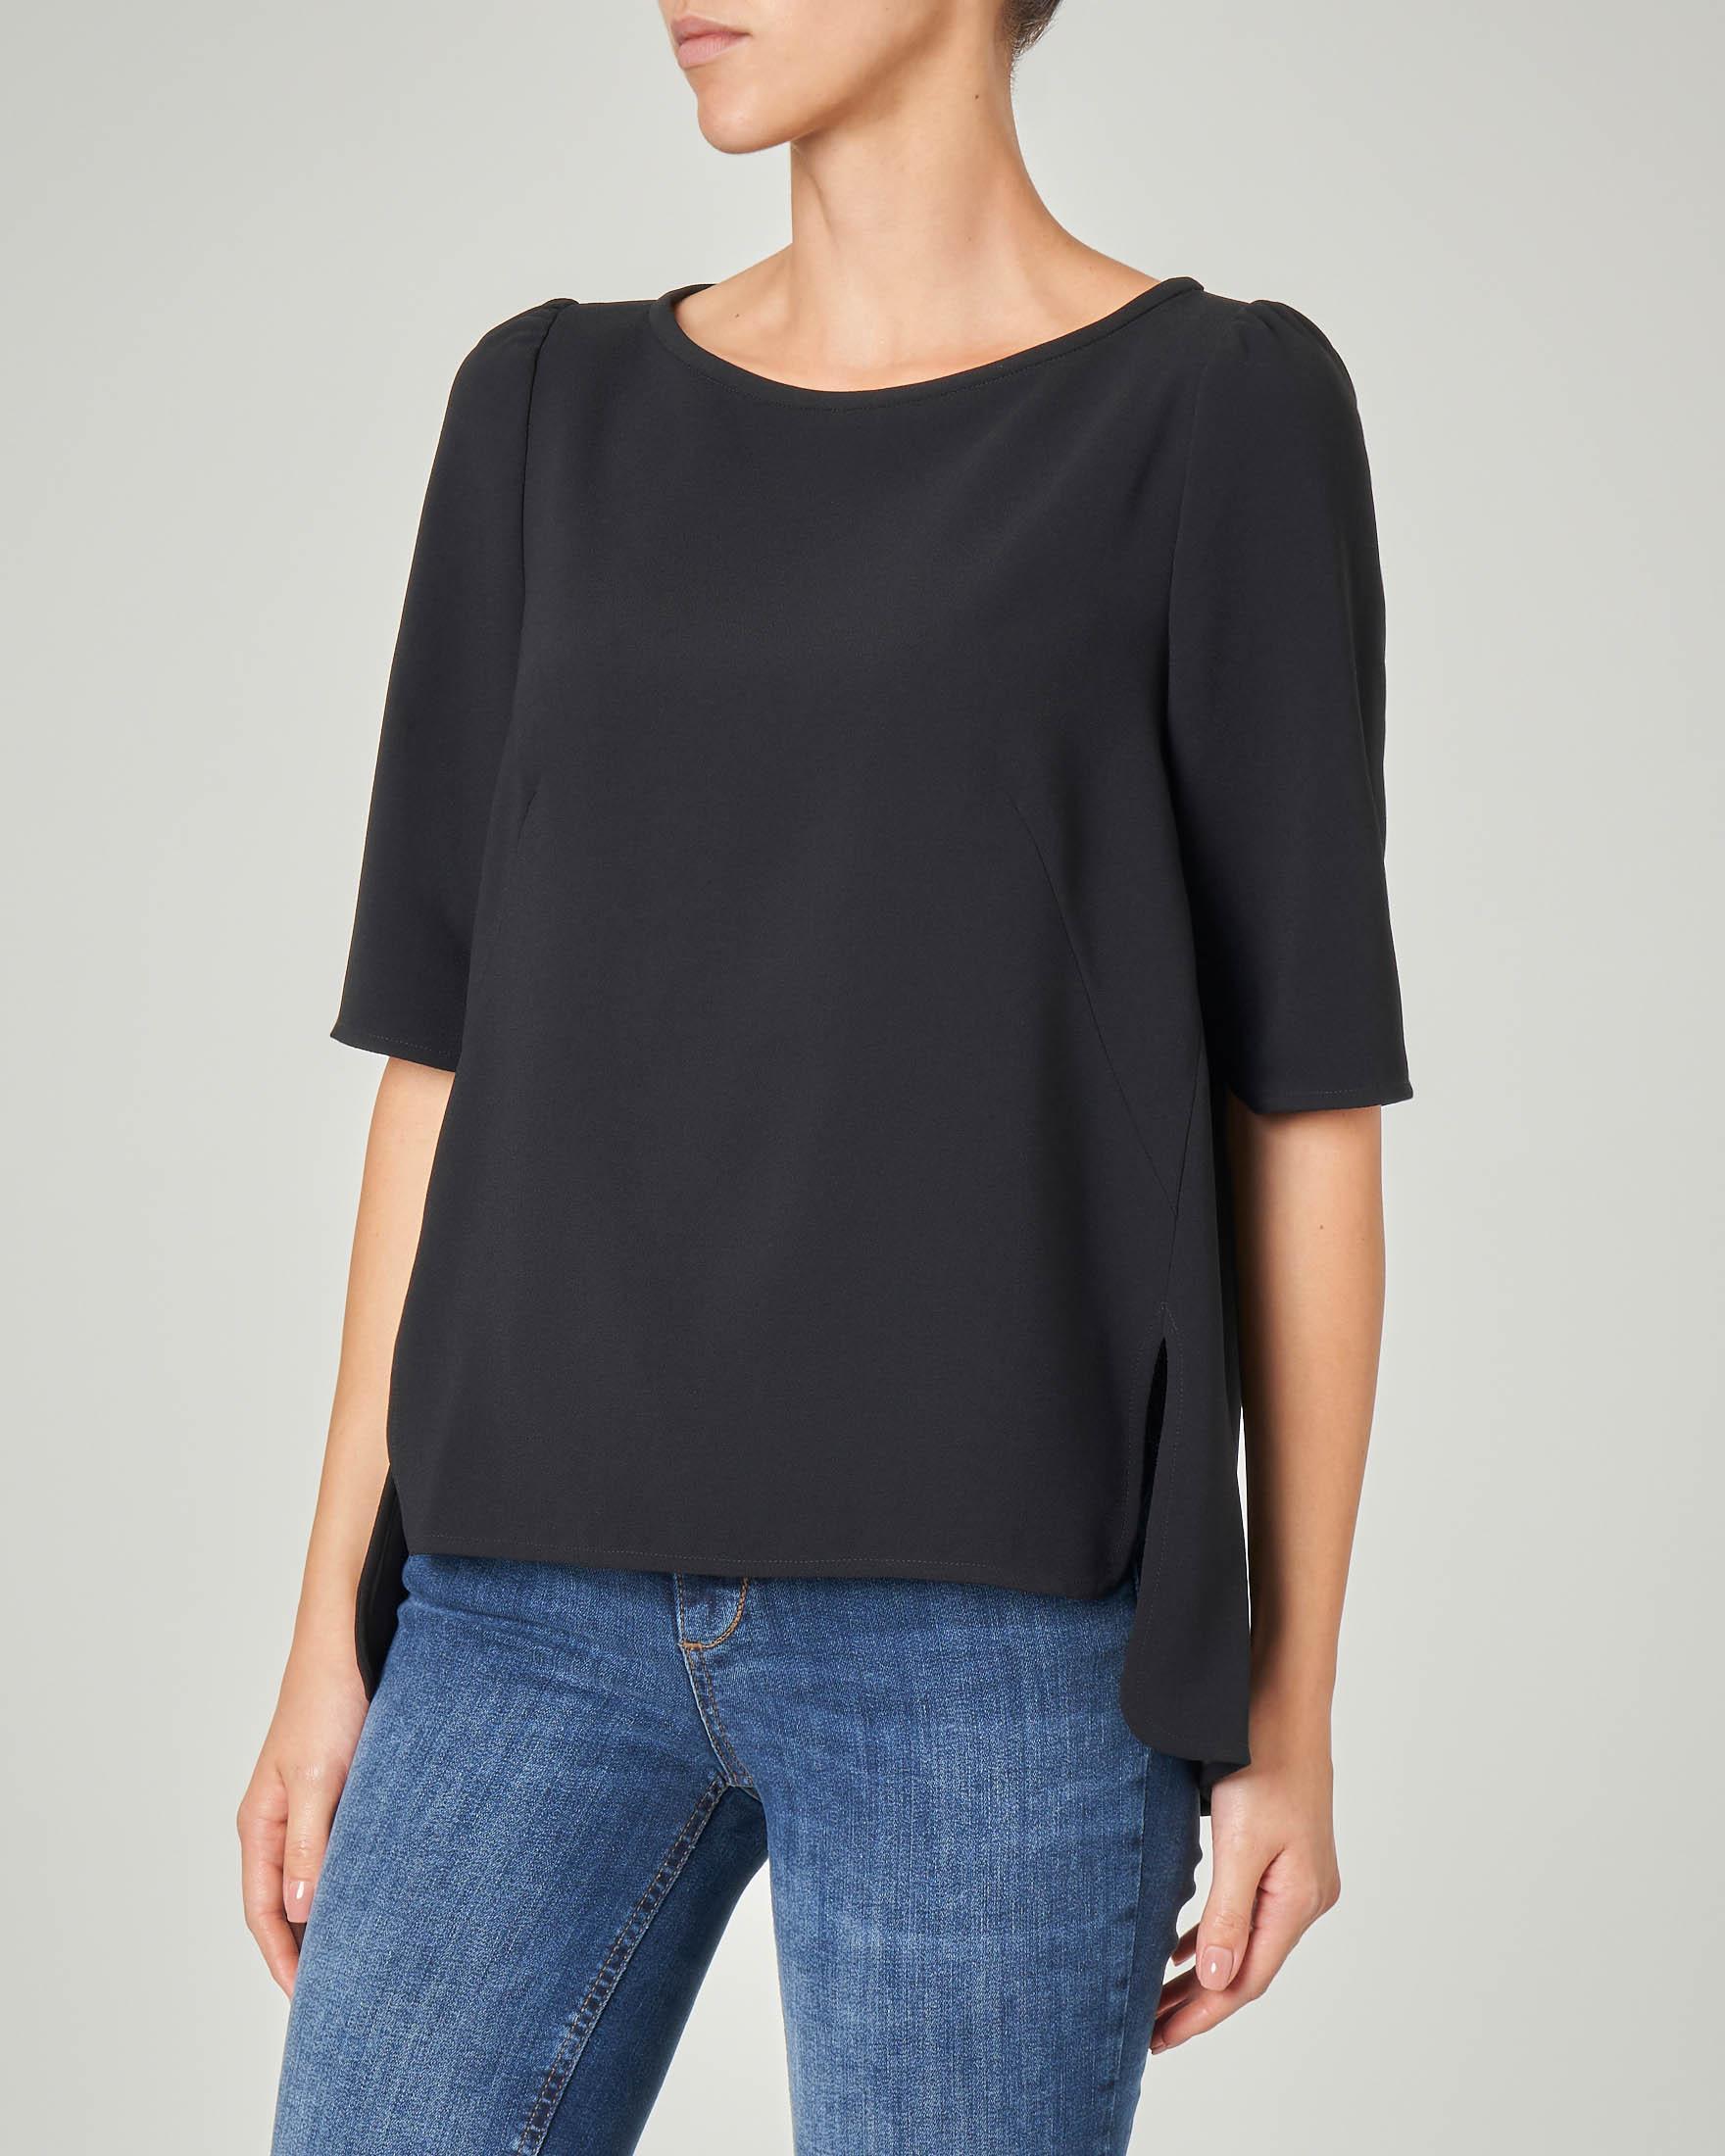 sale retailer 9ffda f3406 Camicie Eleganti Donna: scoprile tutte Online   Pellizzari